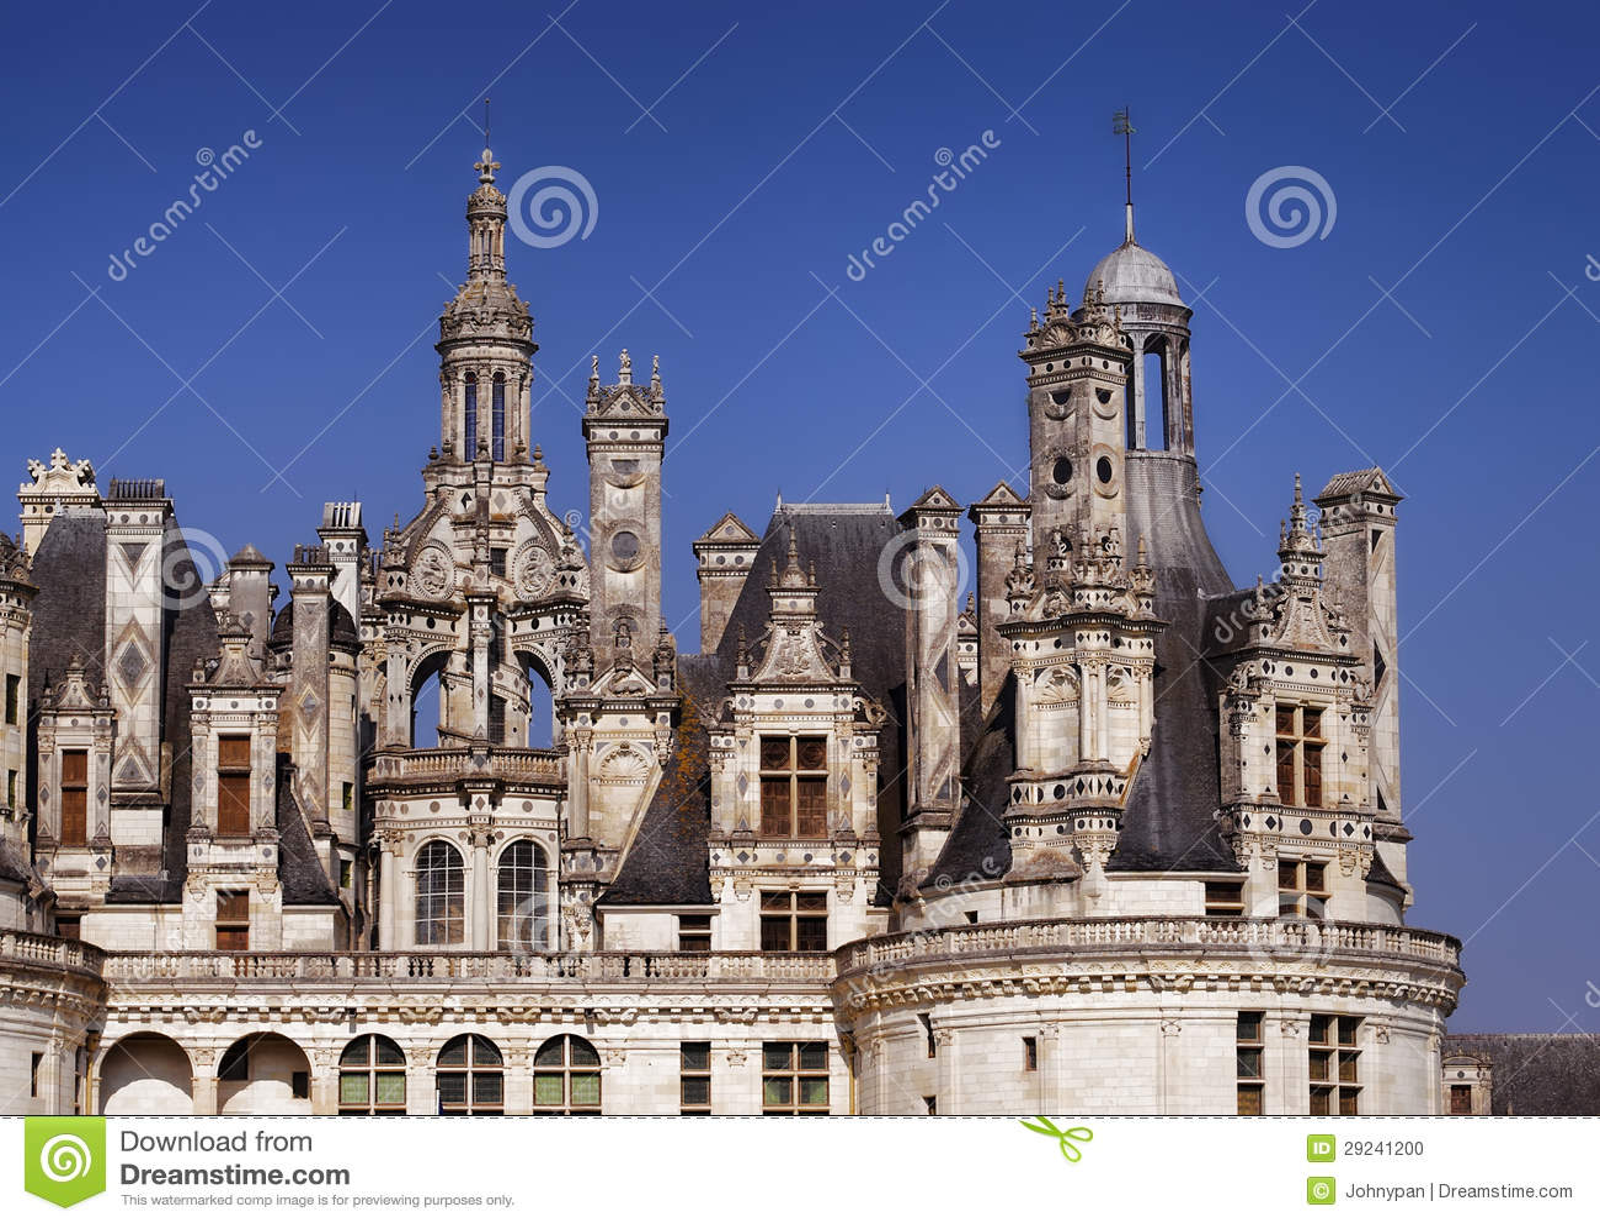 Download Castelo de Chambord foto de stock. Imagem de europa, palácio - 29241200